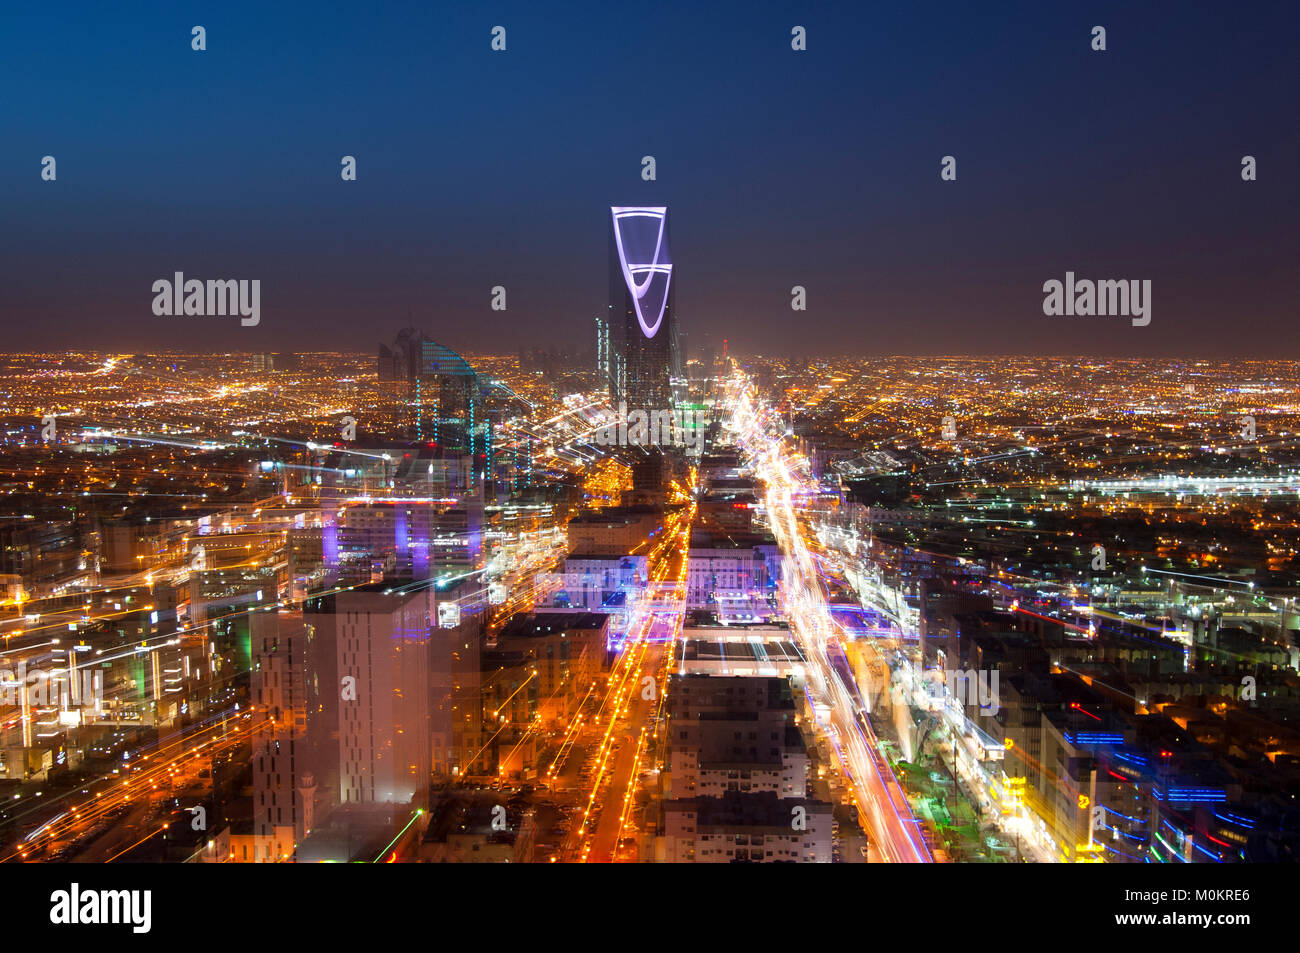 Riyadh skyline at night #3 - Stock Image